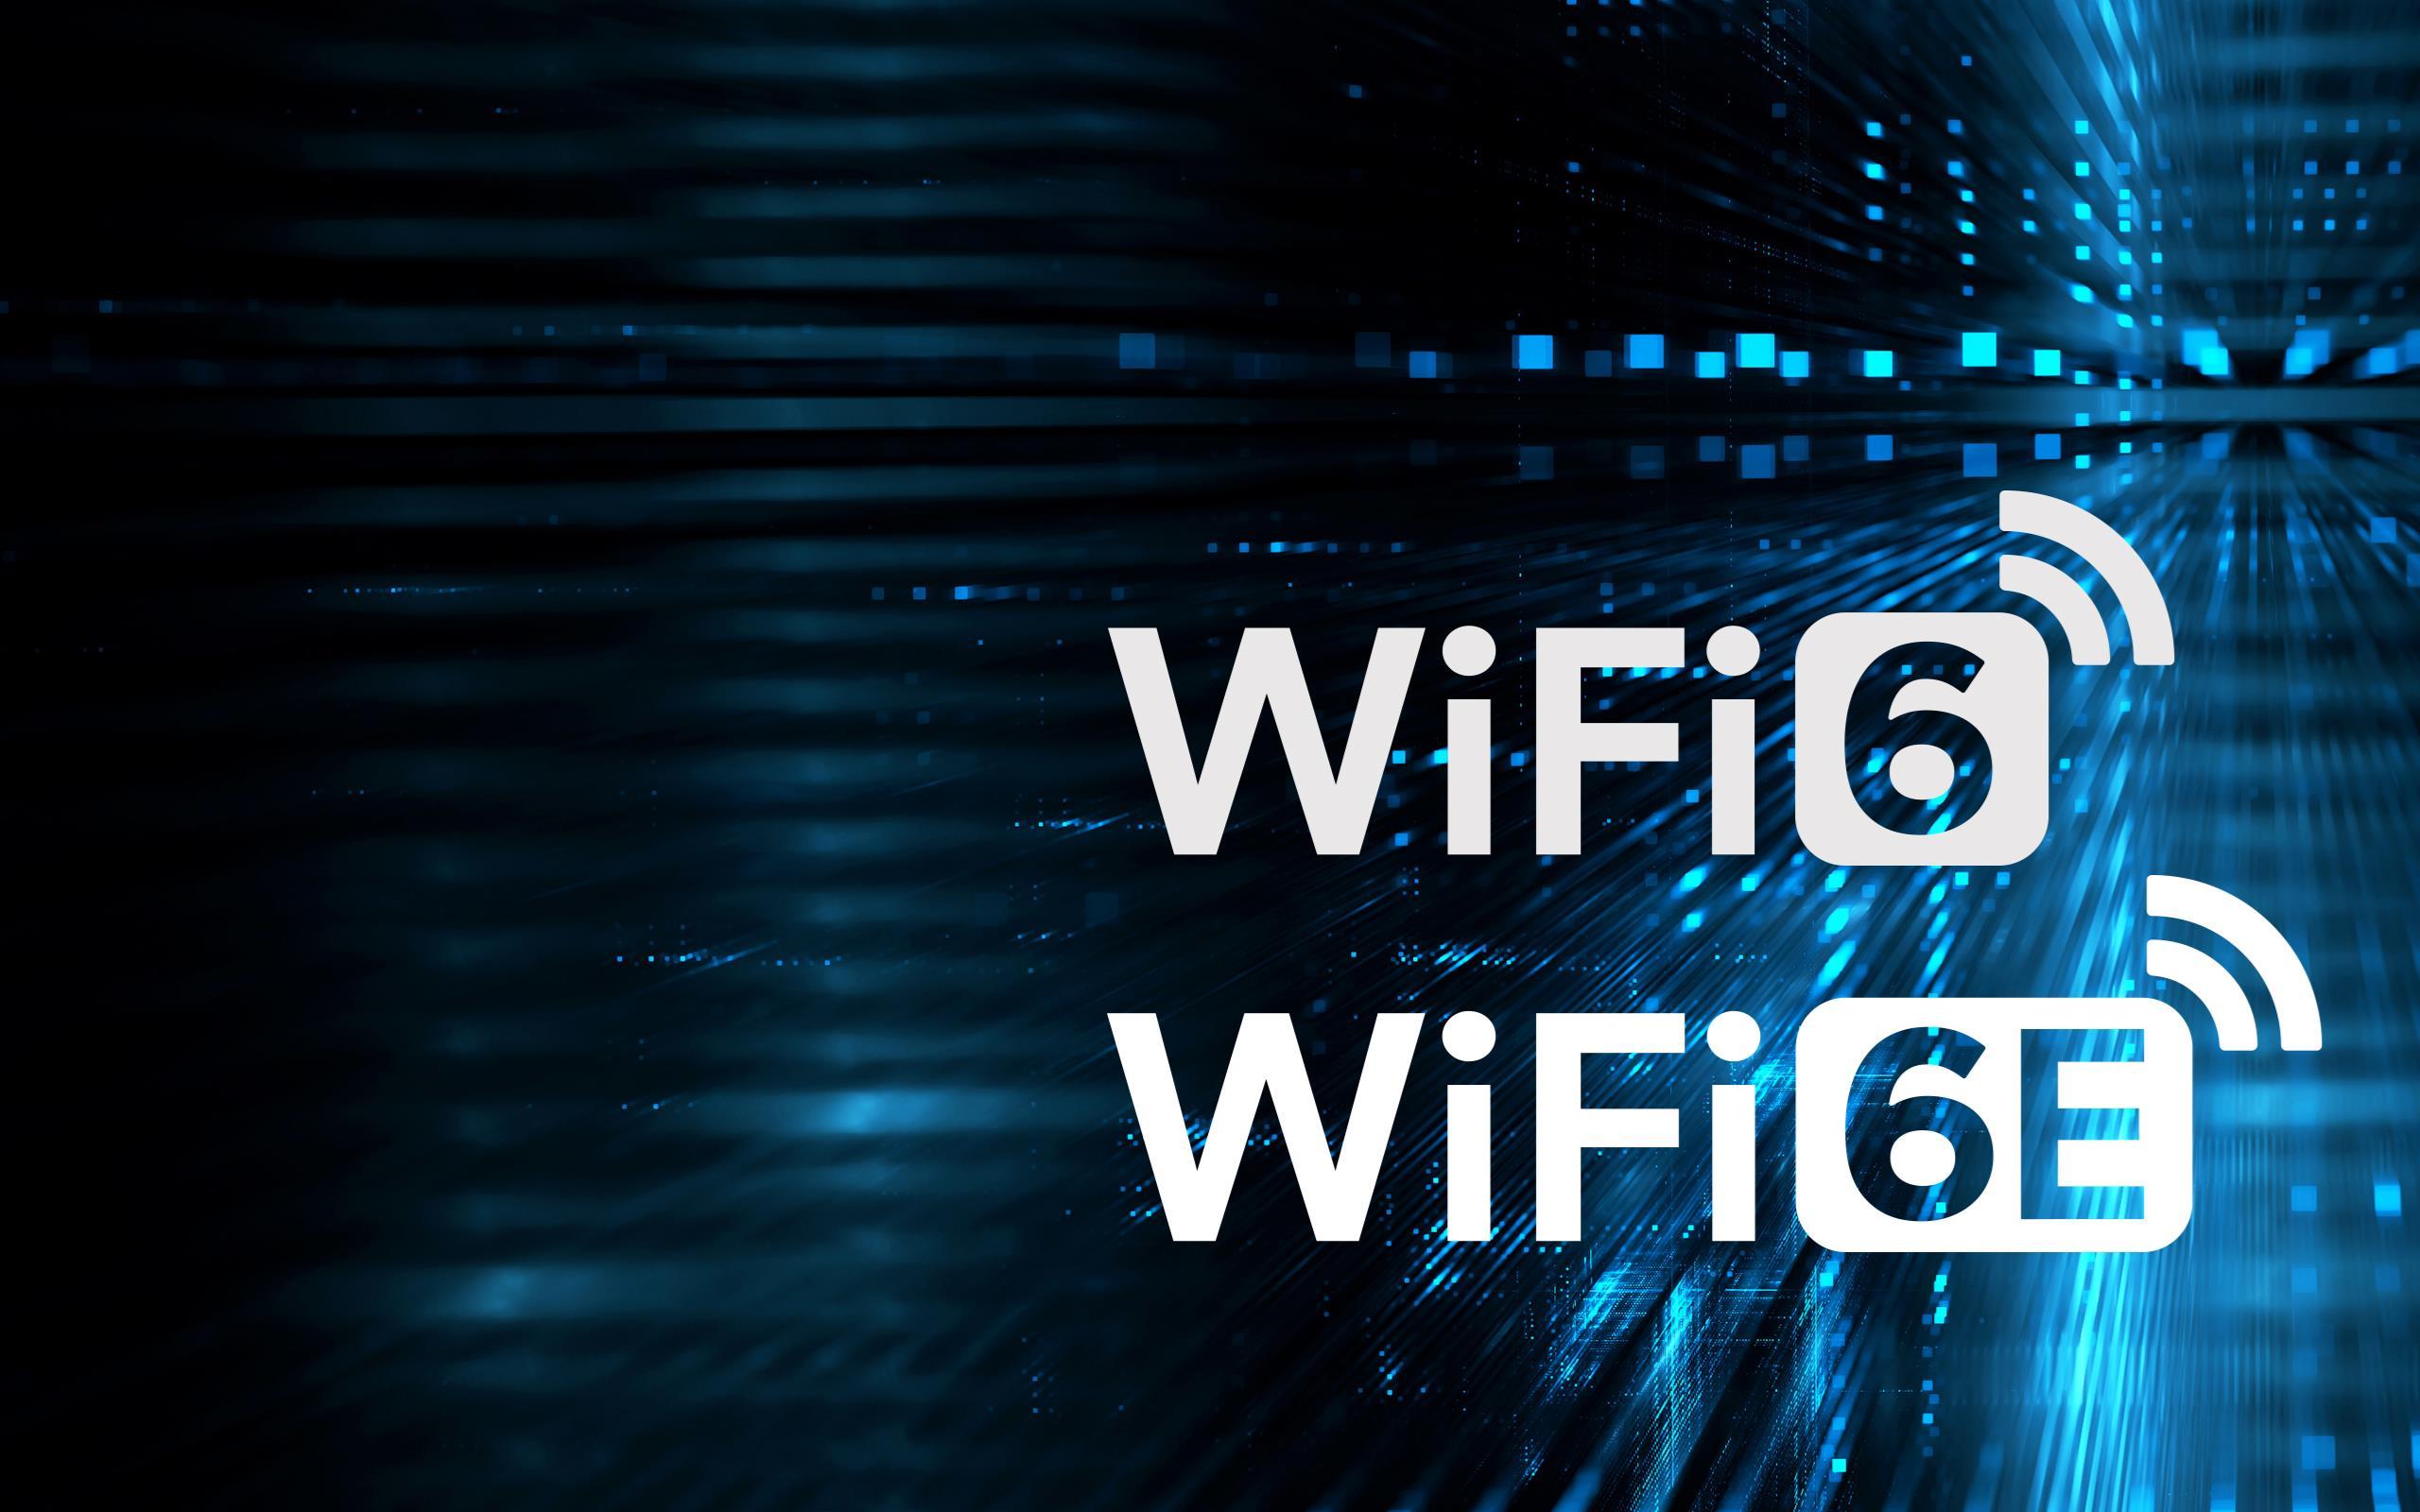 WiFi 6 & WiFi 6E